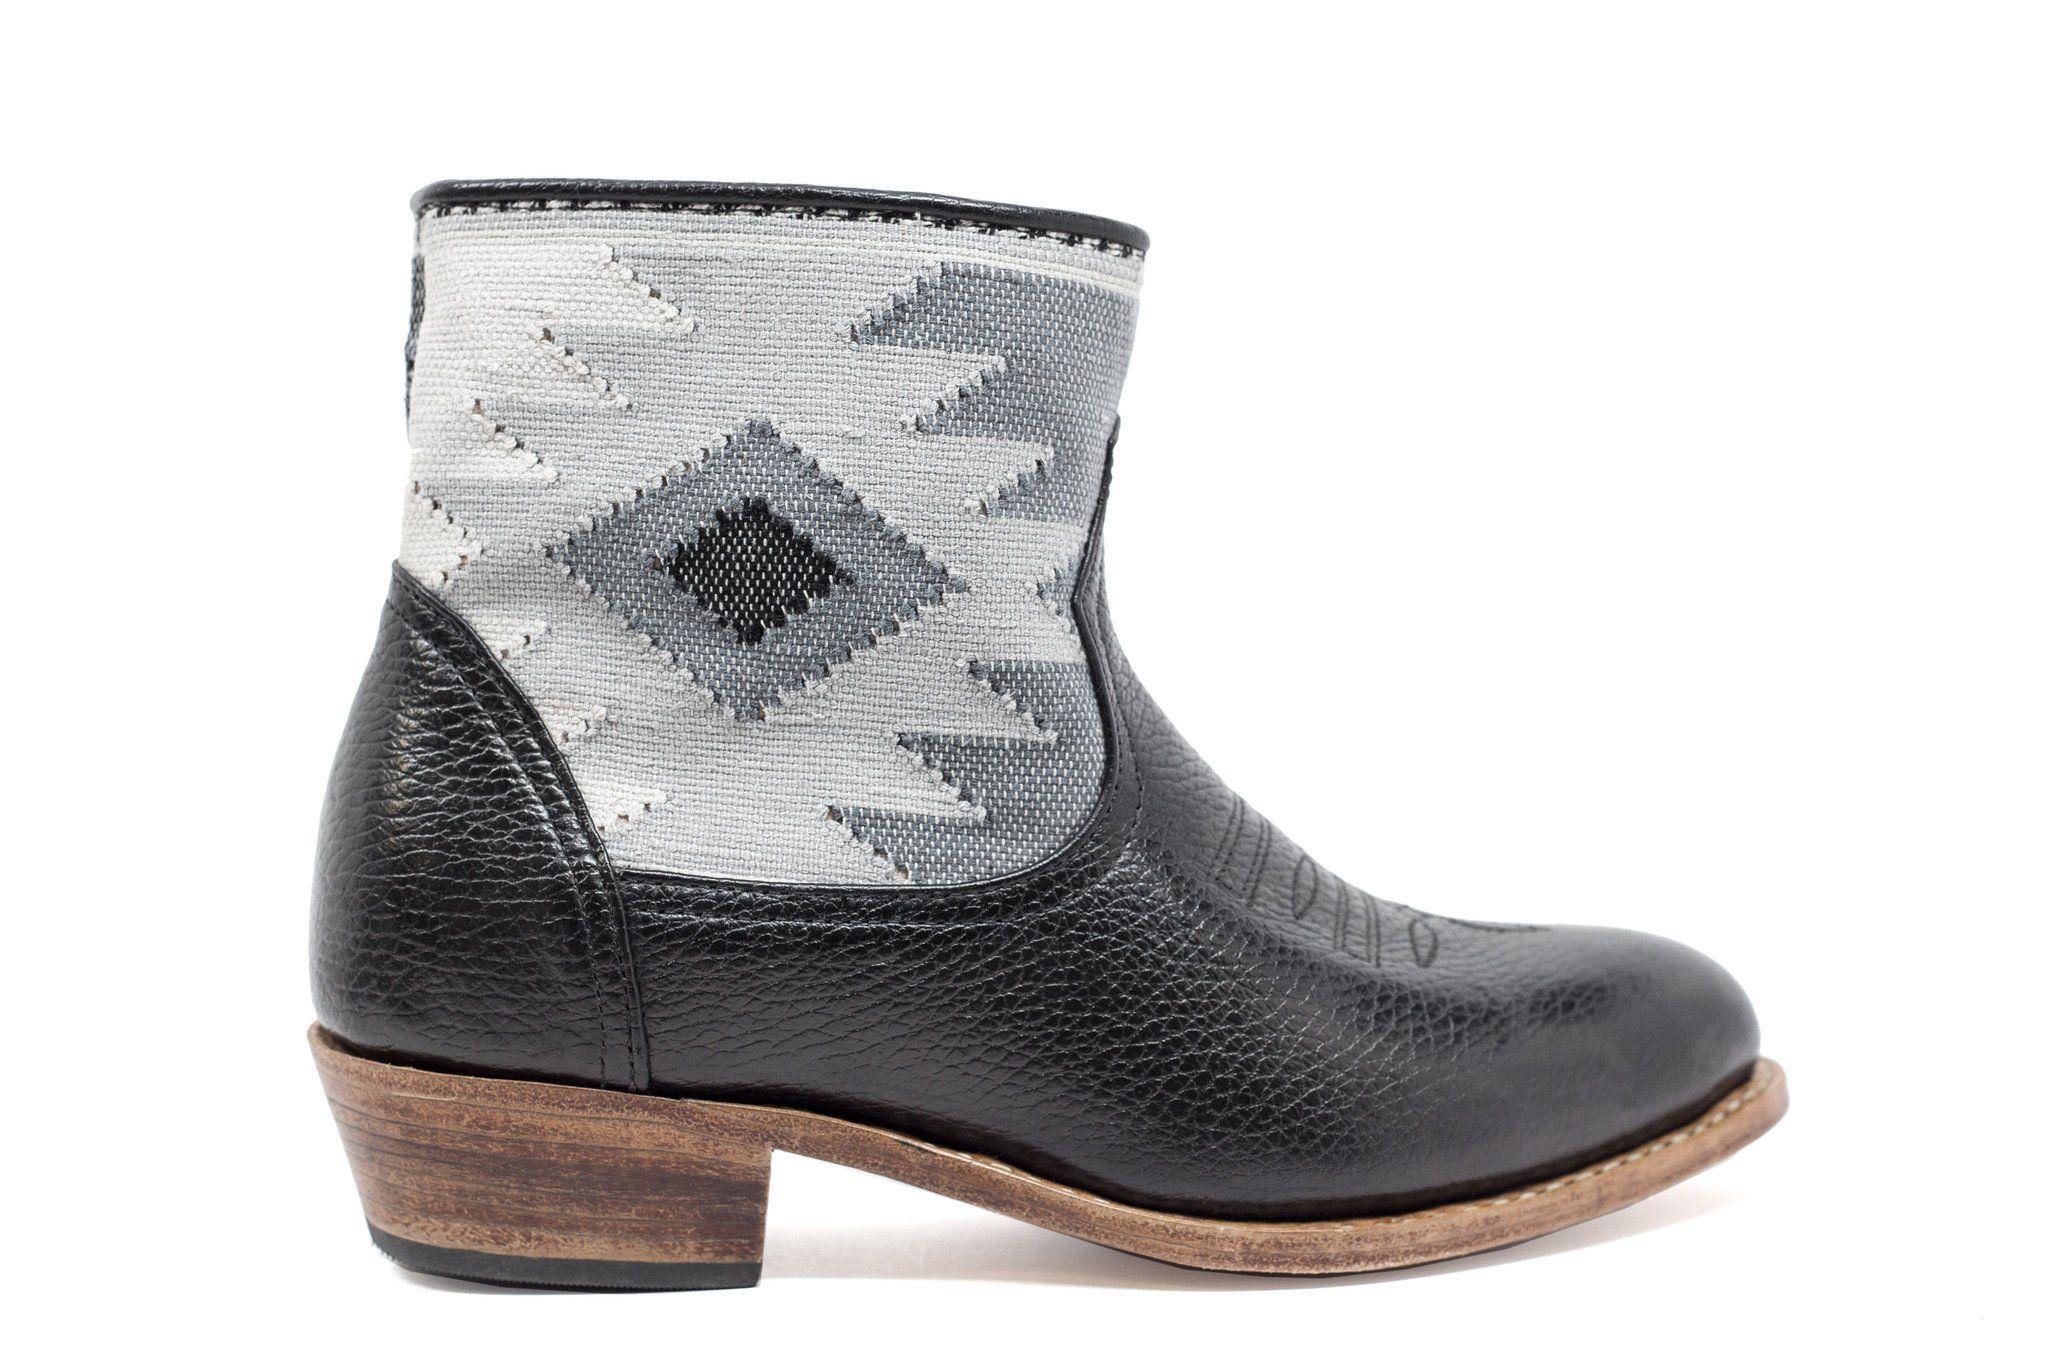 Boots, Short boots, Shoe boots